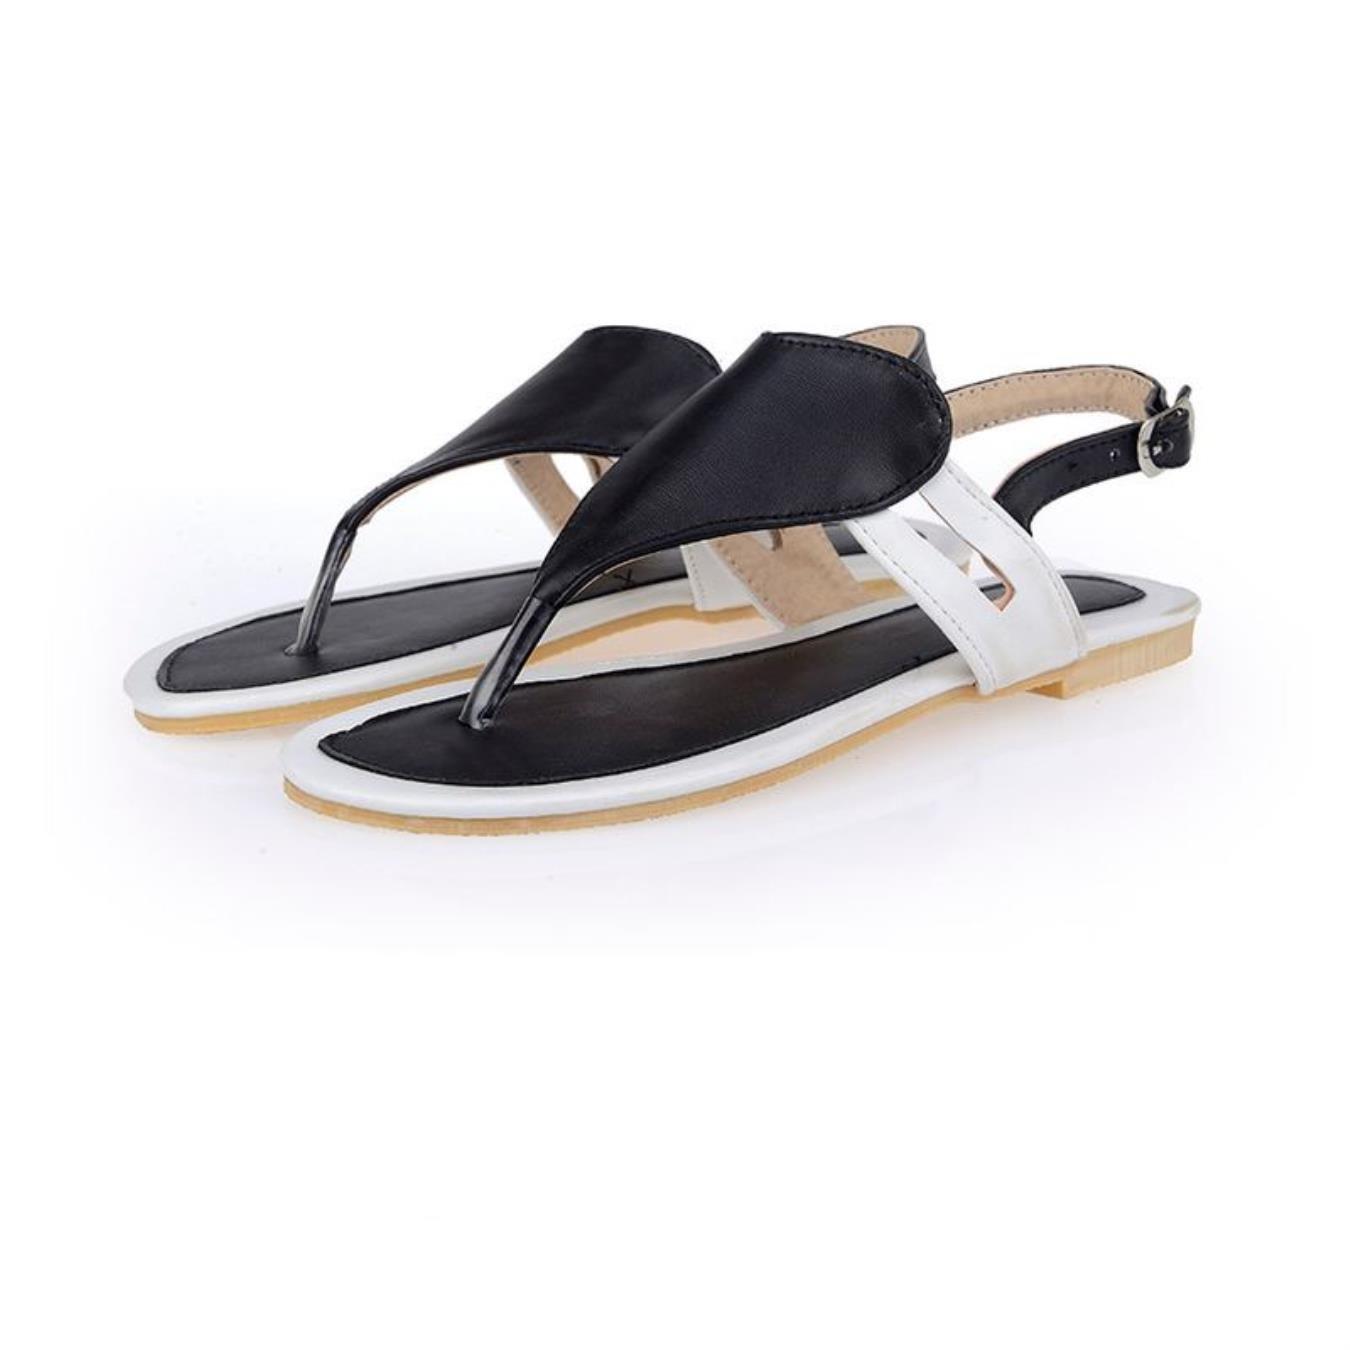 981bdf9f6c02 Women summer flip flops clip toe gladiator sandals clothing jpg 1350x1350  Gladiator flip flops